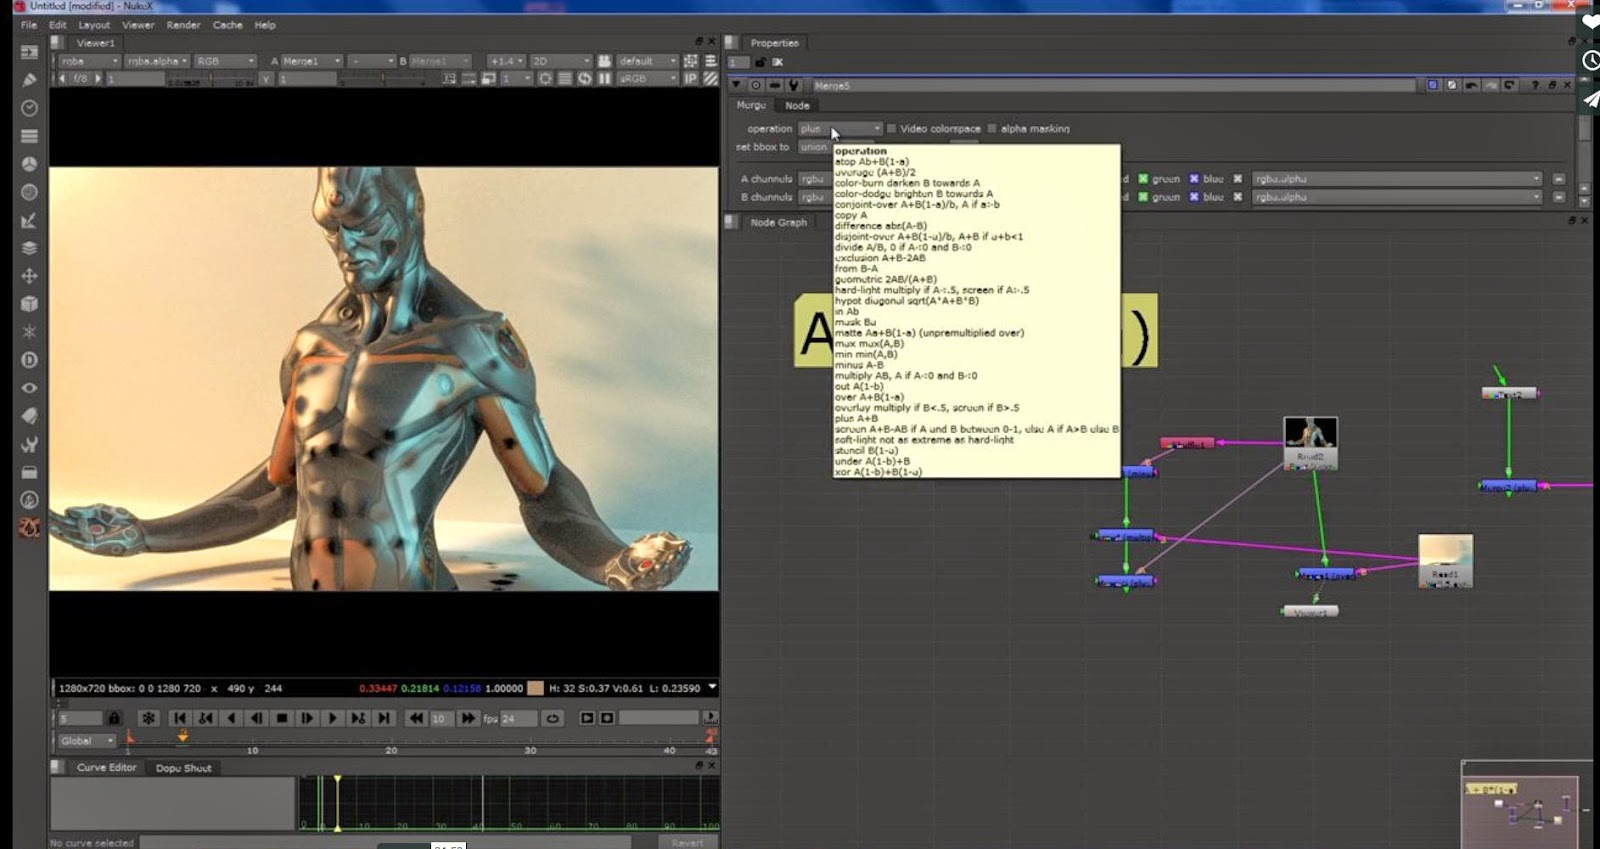 Nuke basic Compositing tutorial with Merge Node | CG TUTORIAL